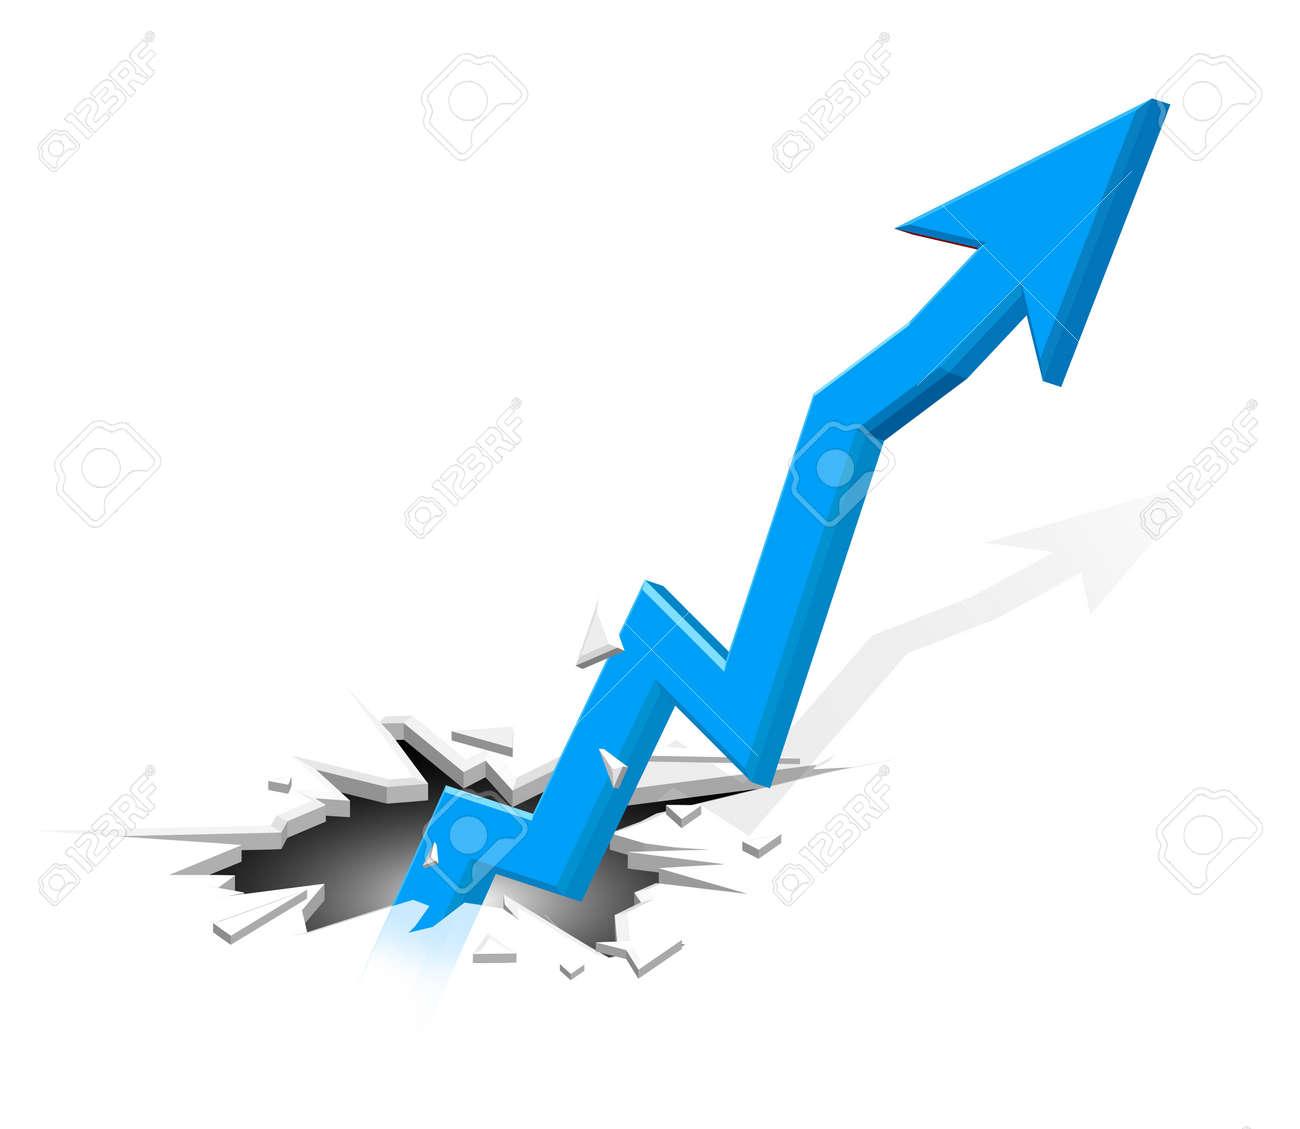 Groundbreaking growing up arrow - 14515910